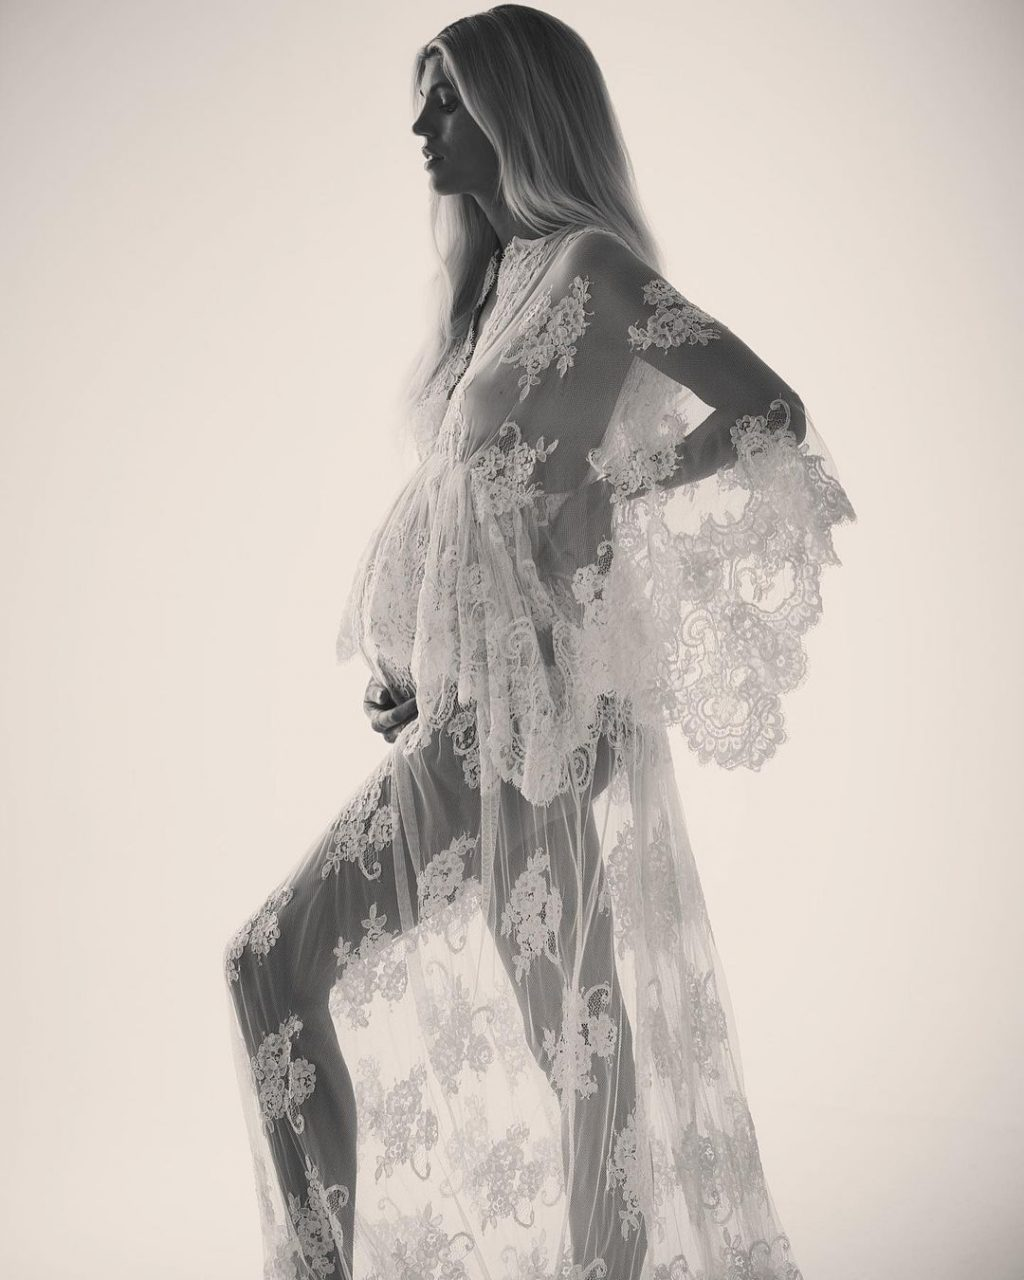 Devon Windsor Nude & Sexy Collection (44 Photos)